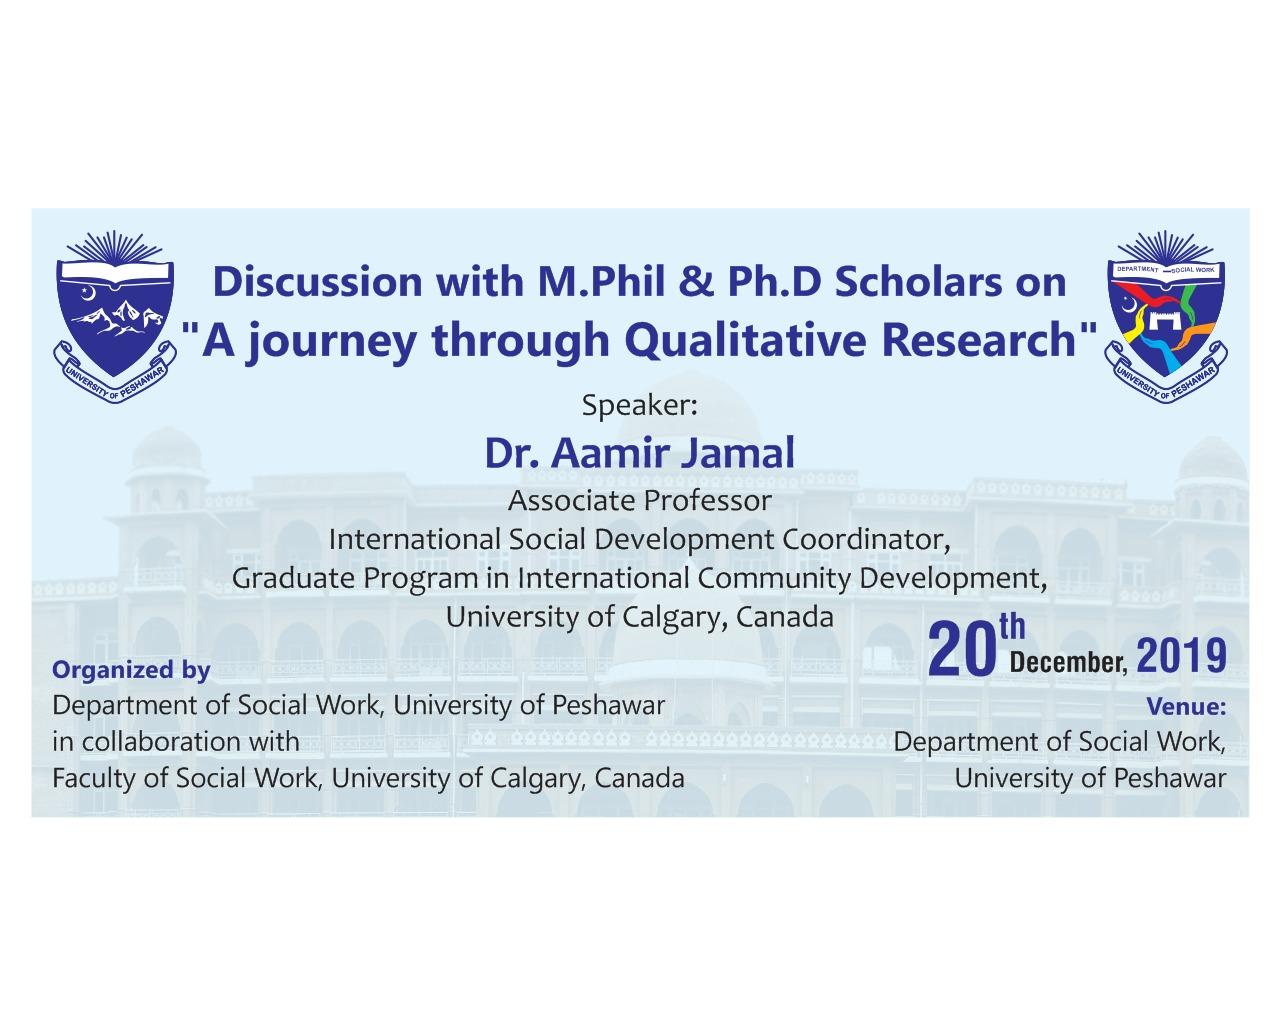 A journey through Qualitative Research